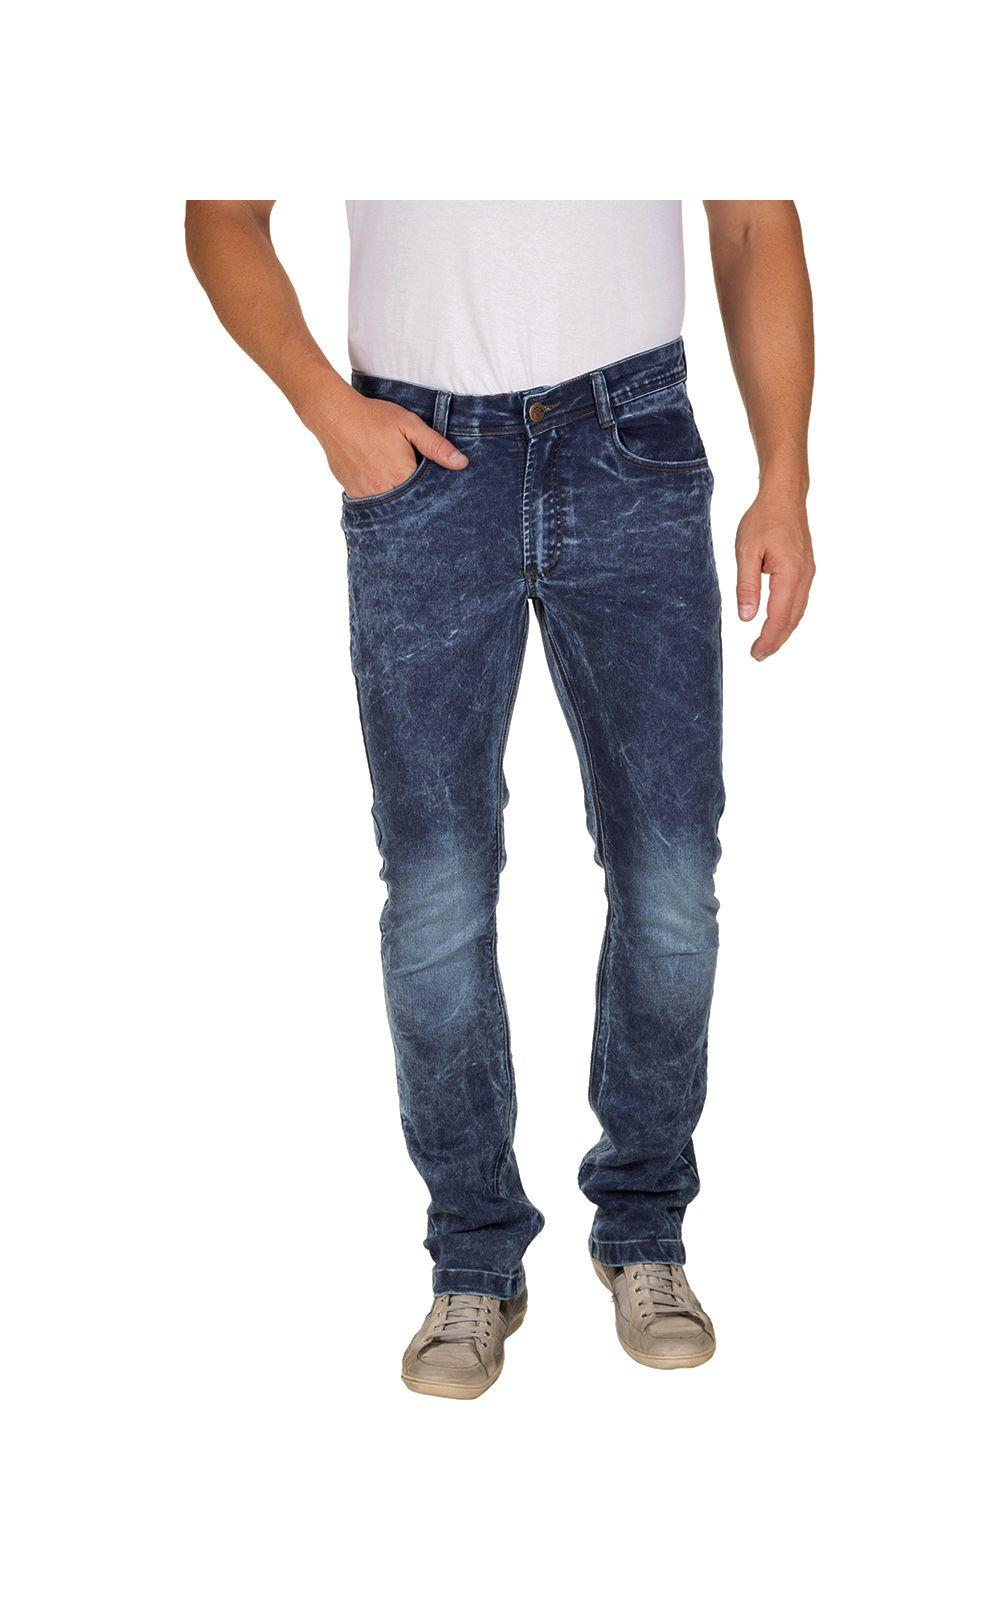 Foto 1 - Calça Jeans Masculina Azul Escuro Texturizada